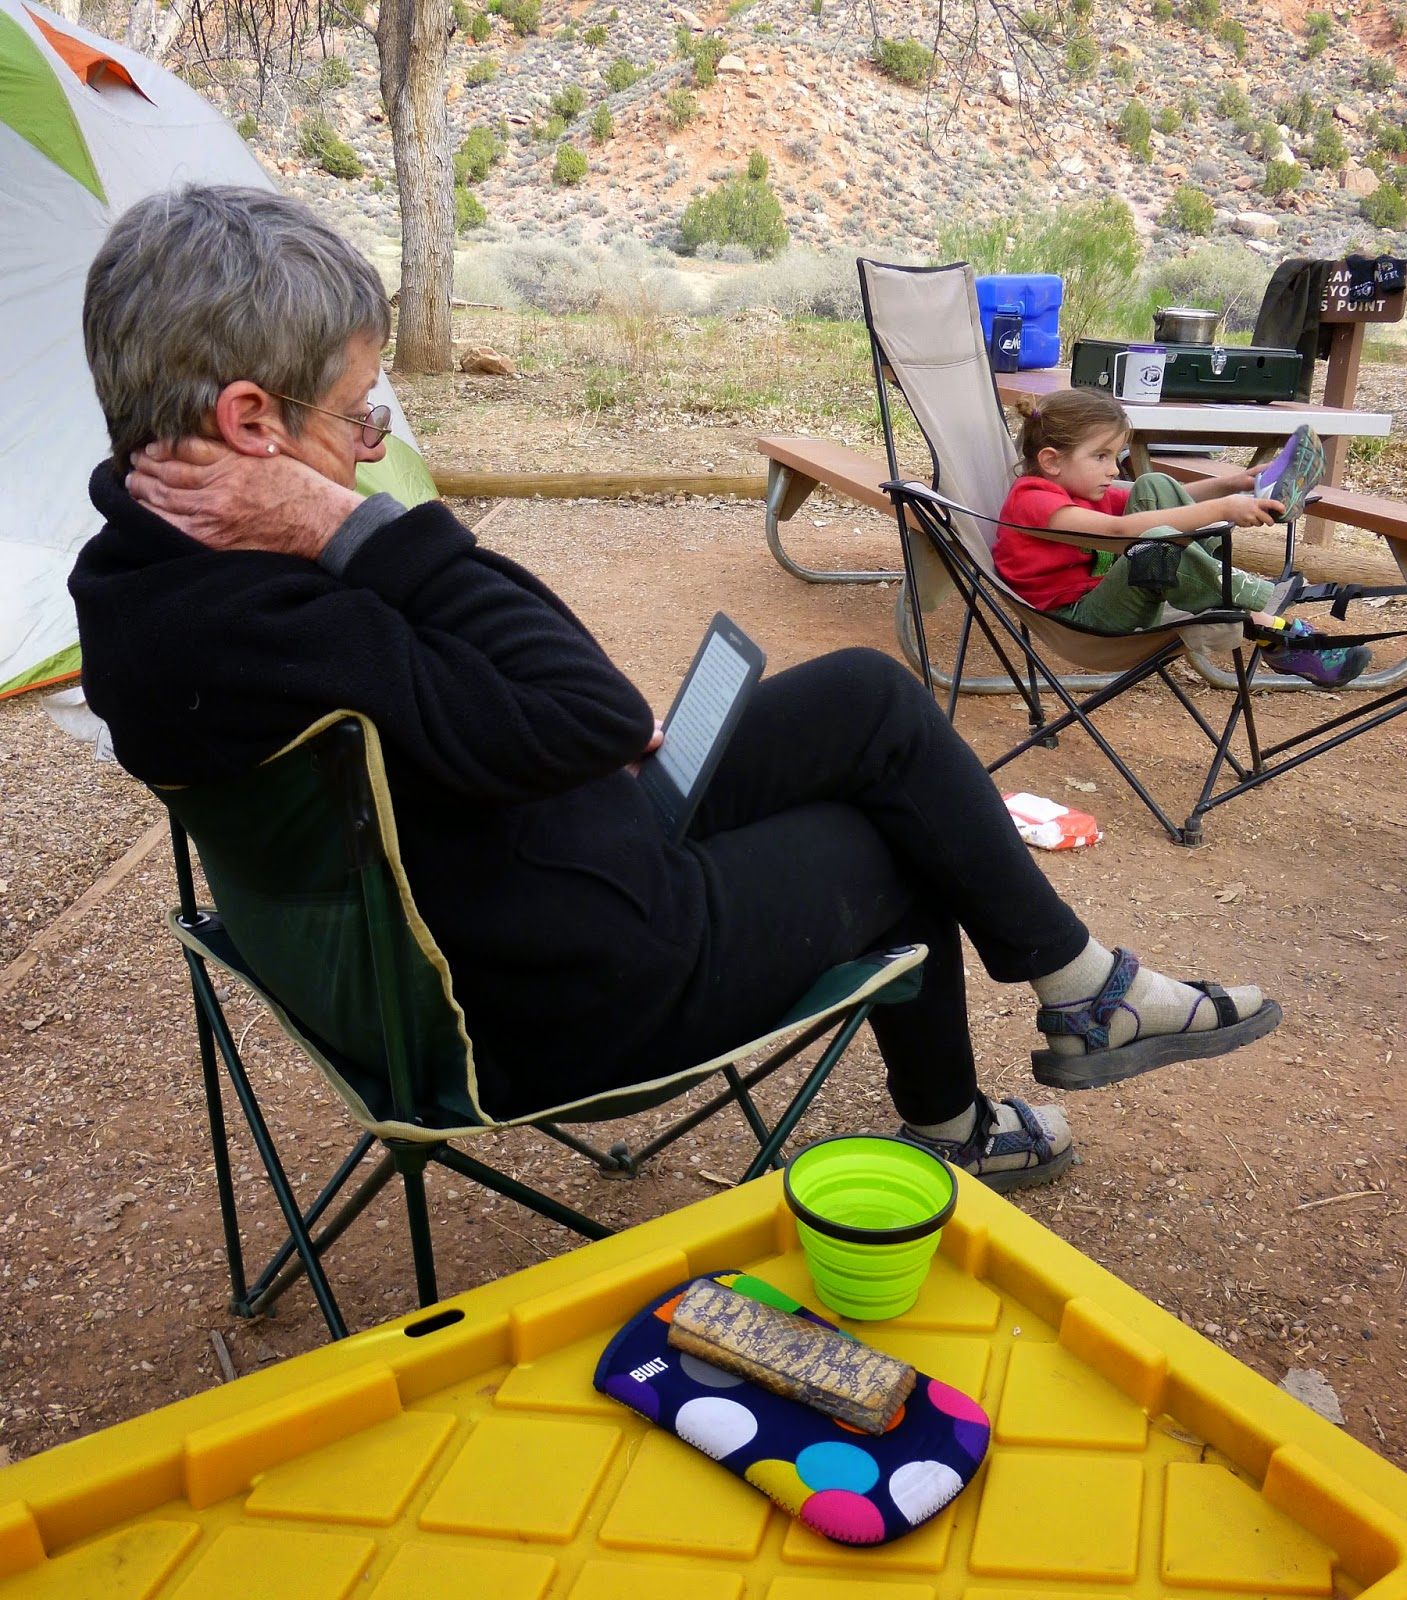 Flora Hiker: Tent camping @ Zion National Park